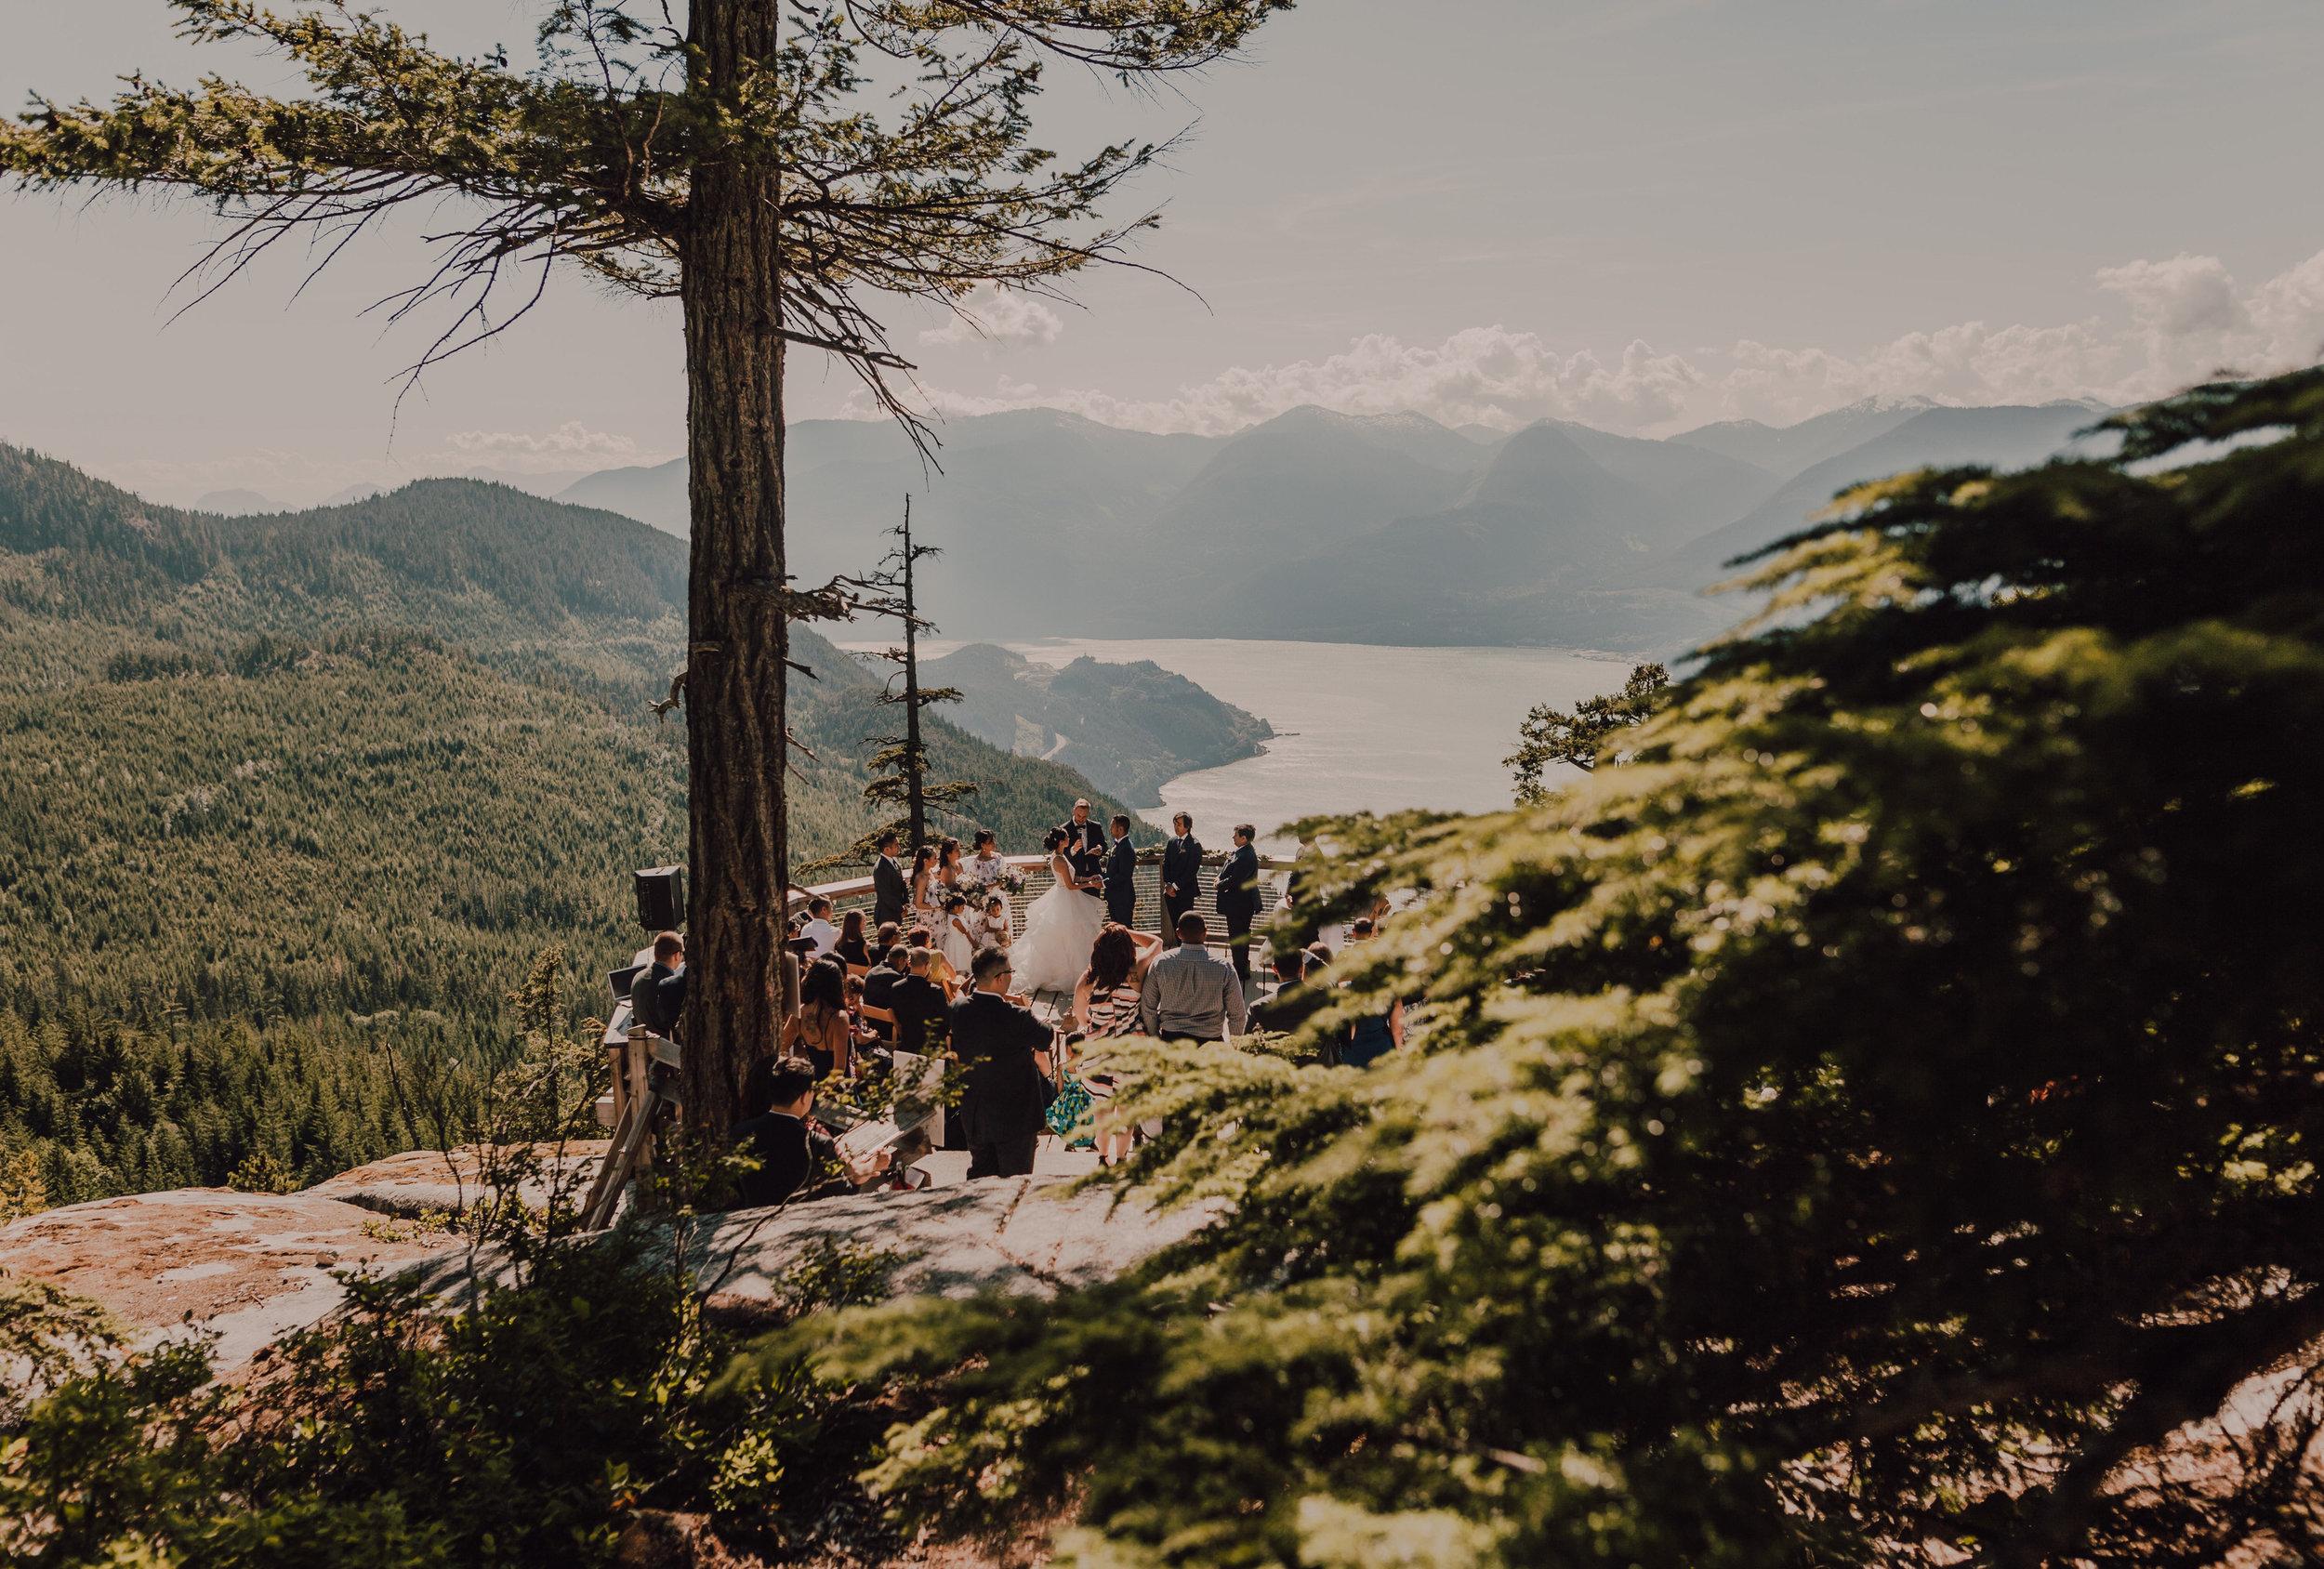 Squamish Wedding Photographer - Sea to Sky Gondola Wedding Photos -  Vancouver Wedding Photographer & Videographer - Sunshine Coast Wedding Photos - Sunshine Coast Wedding Photographer - Jennifer Picard Photography - IMG_0423.jpg